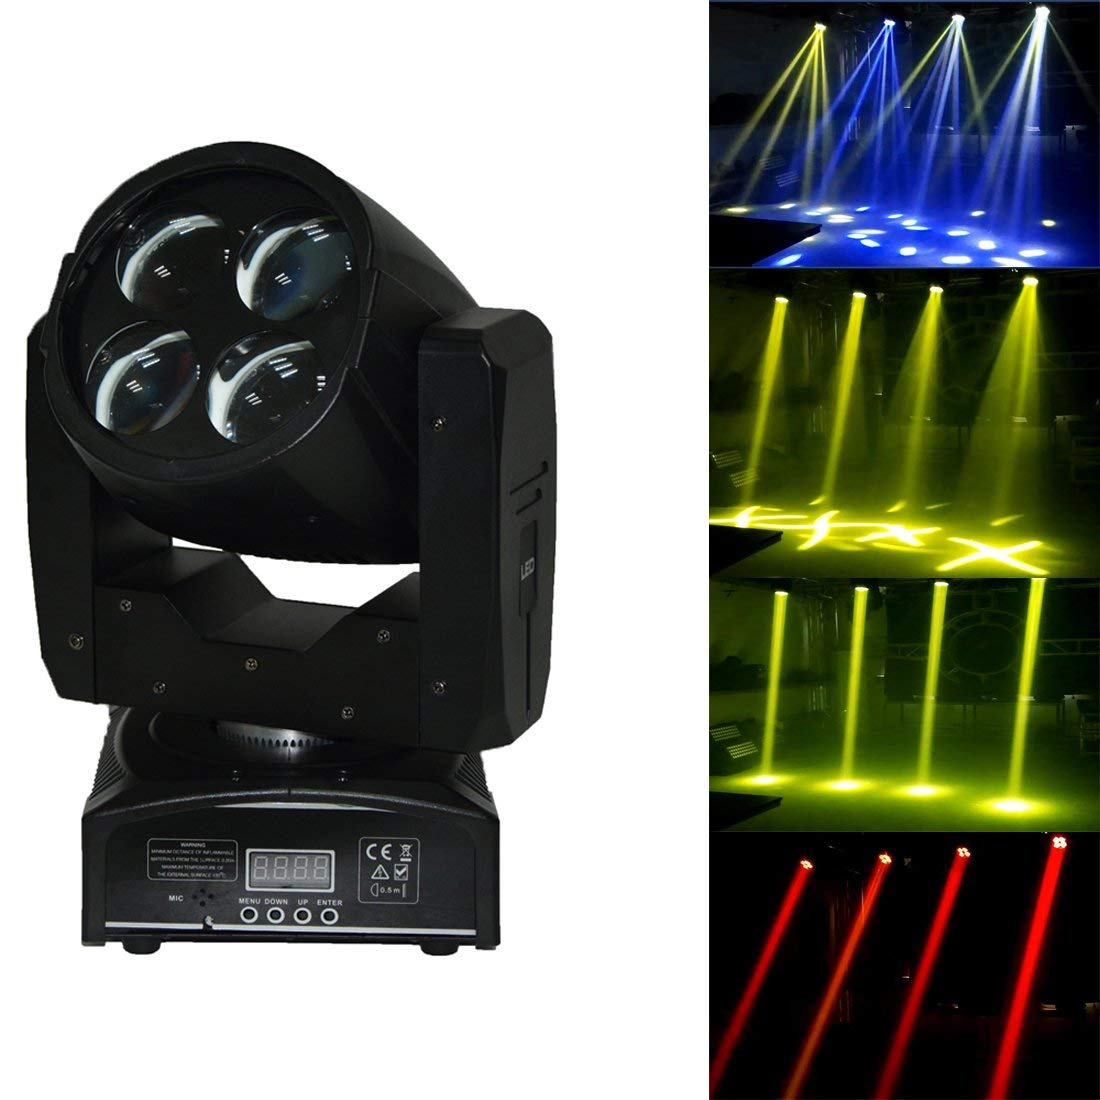 MOKA SFX LED 4pcs Moving Head Beam Lights 4x10W RGBW DMX DJ Lights for Club KTV Stage Party Decorations